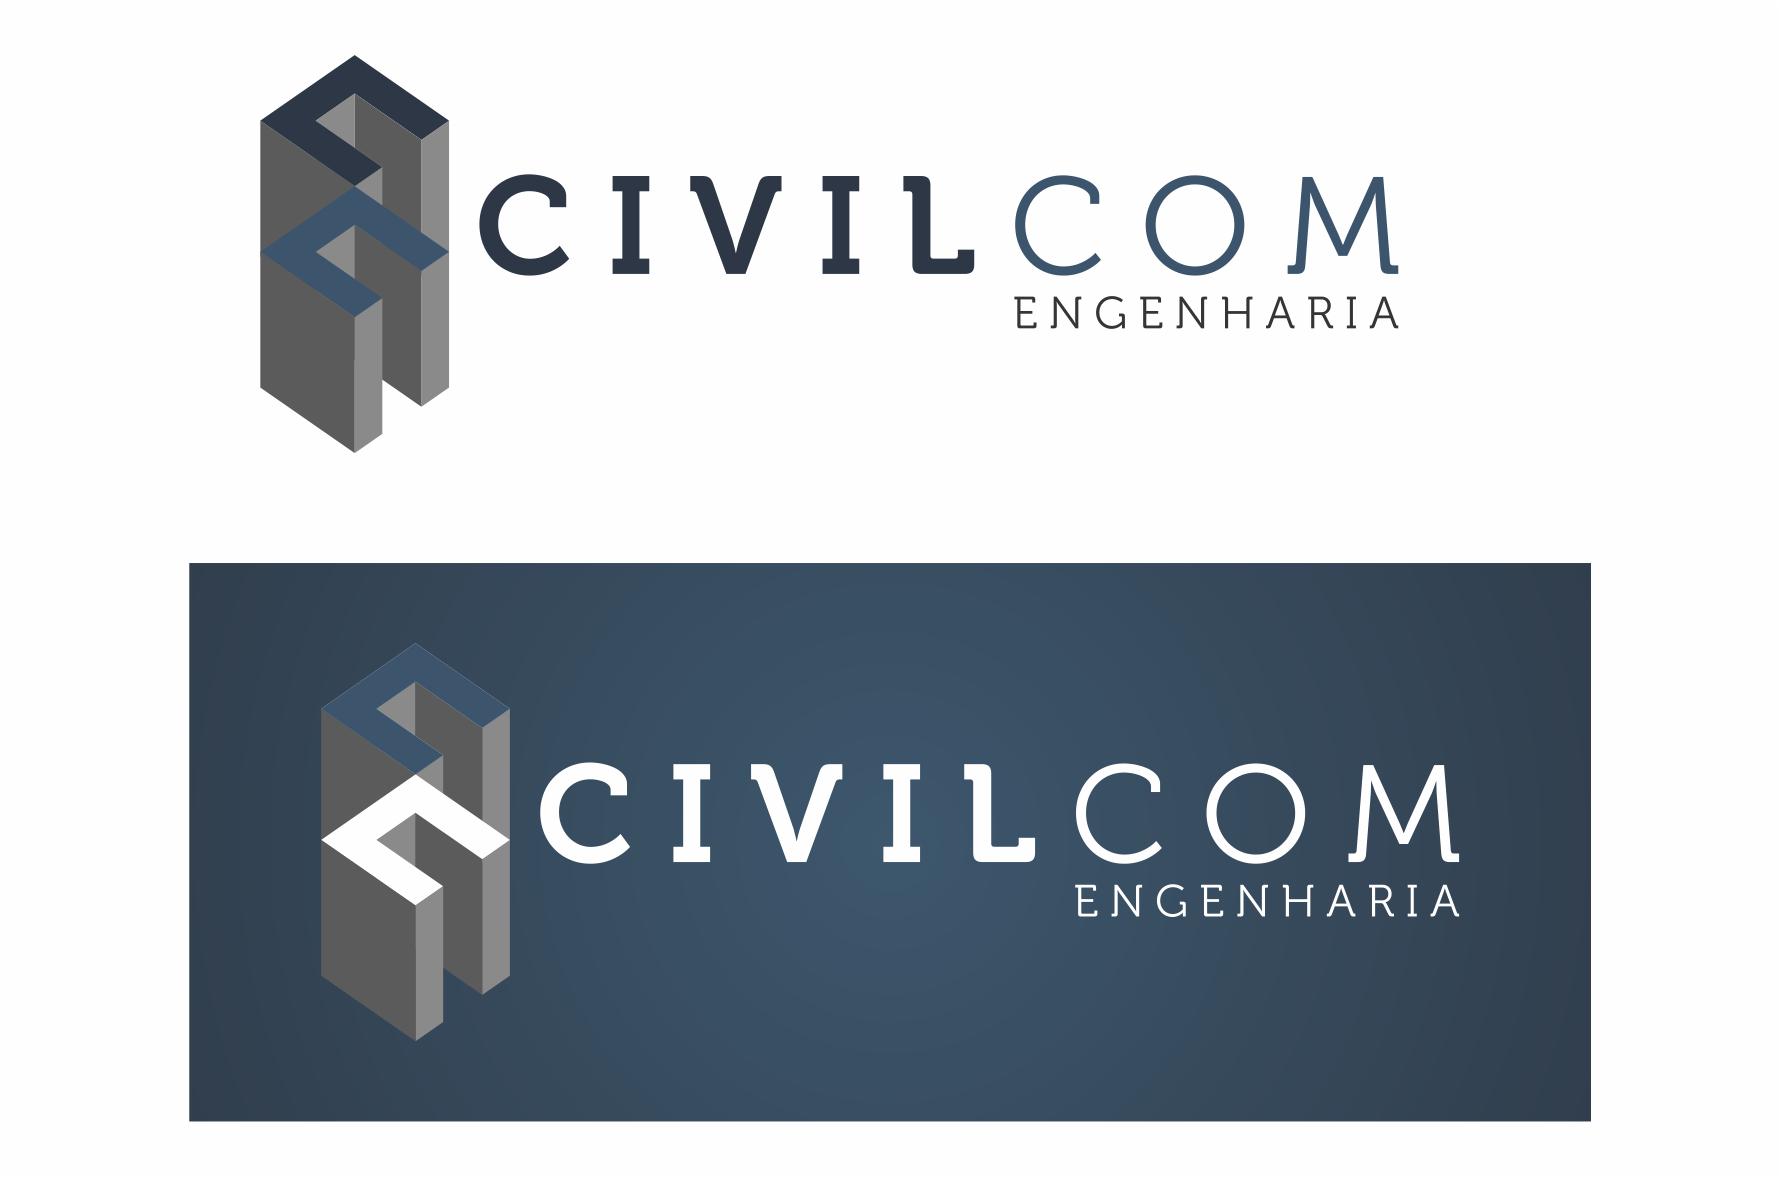 +Branding - Civilcom